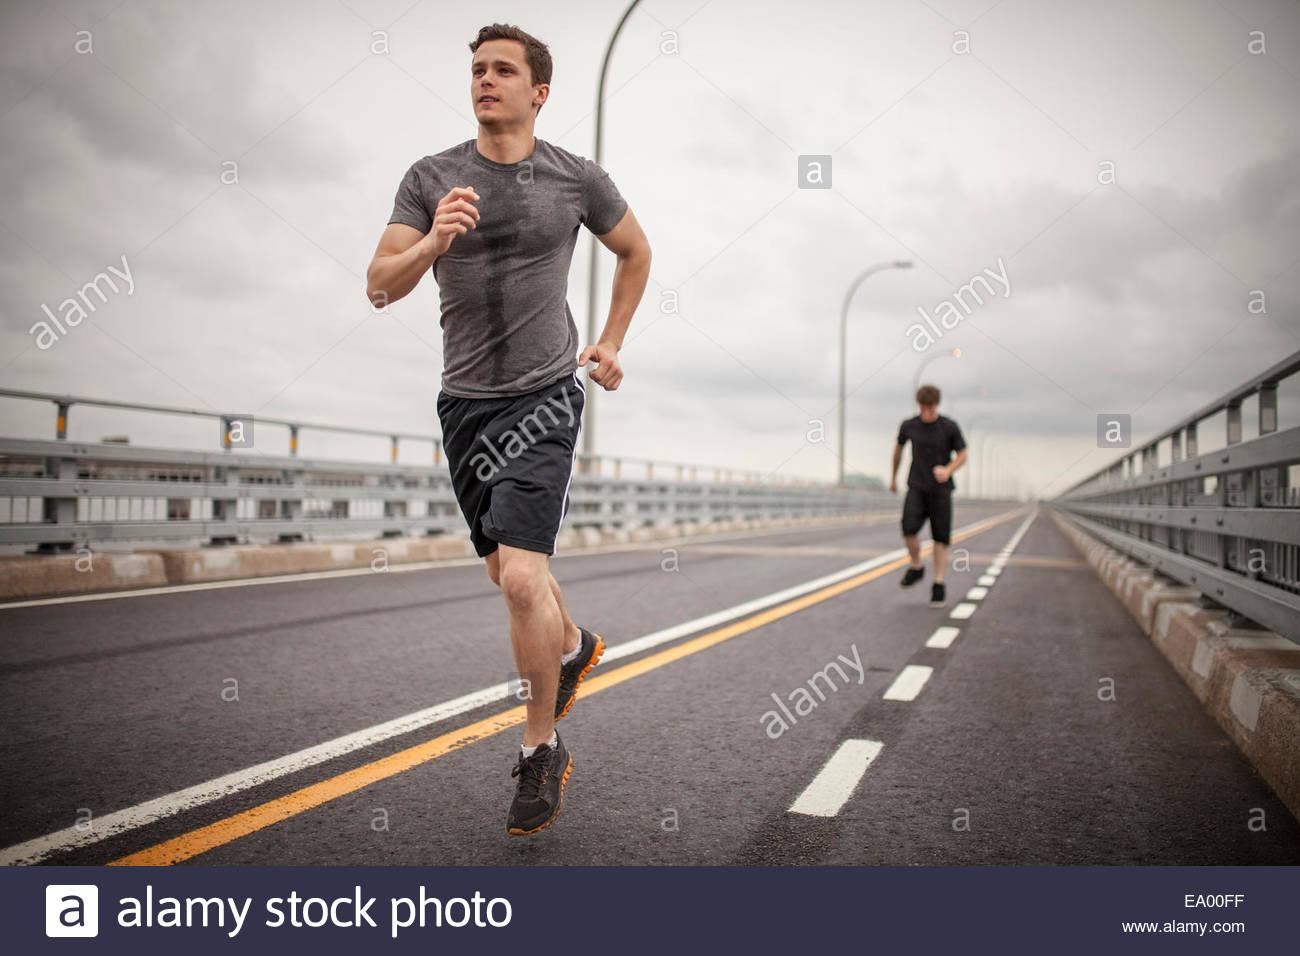 Young men jogging - Stock Image